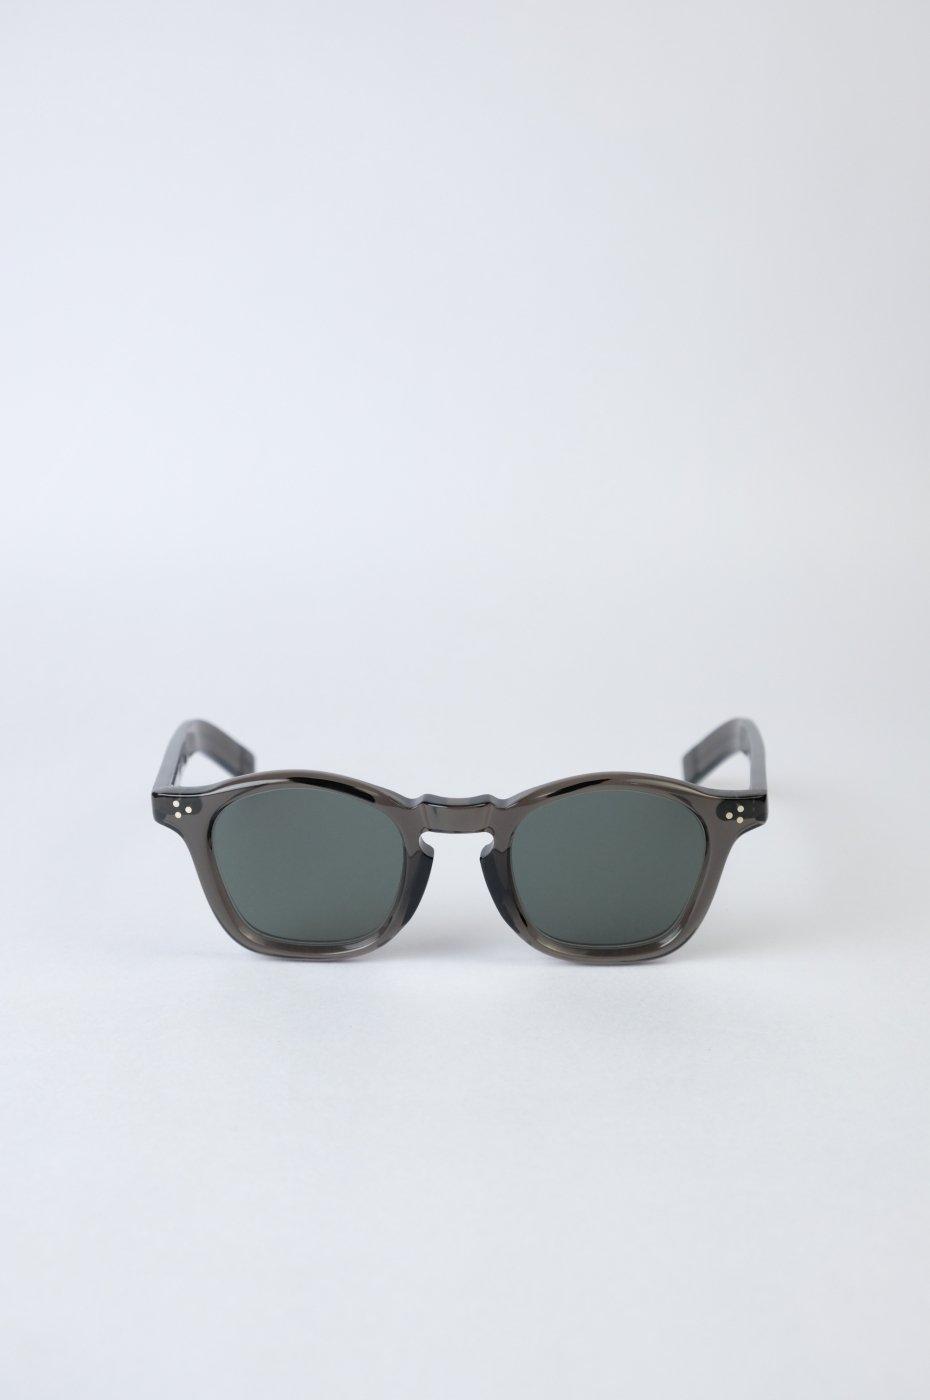 guépard ギュパール-gp-05-Gray-G15 Lens-